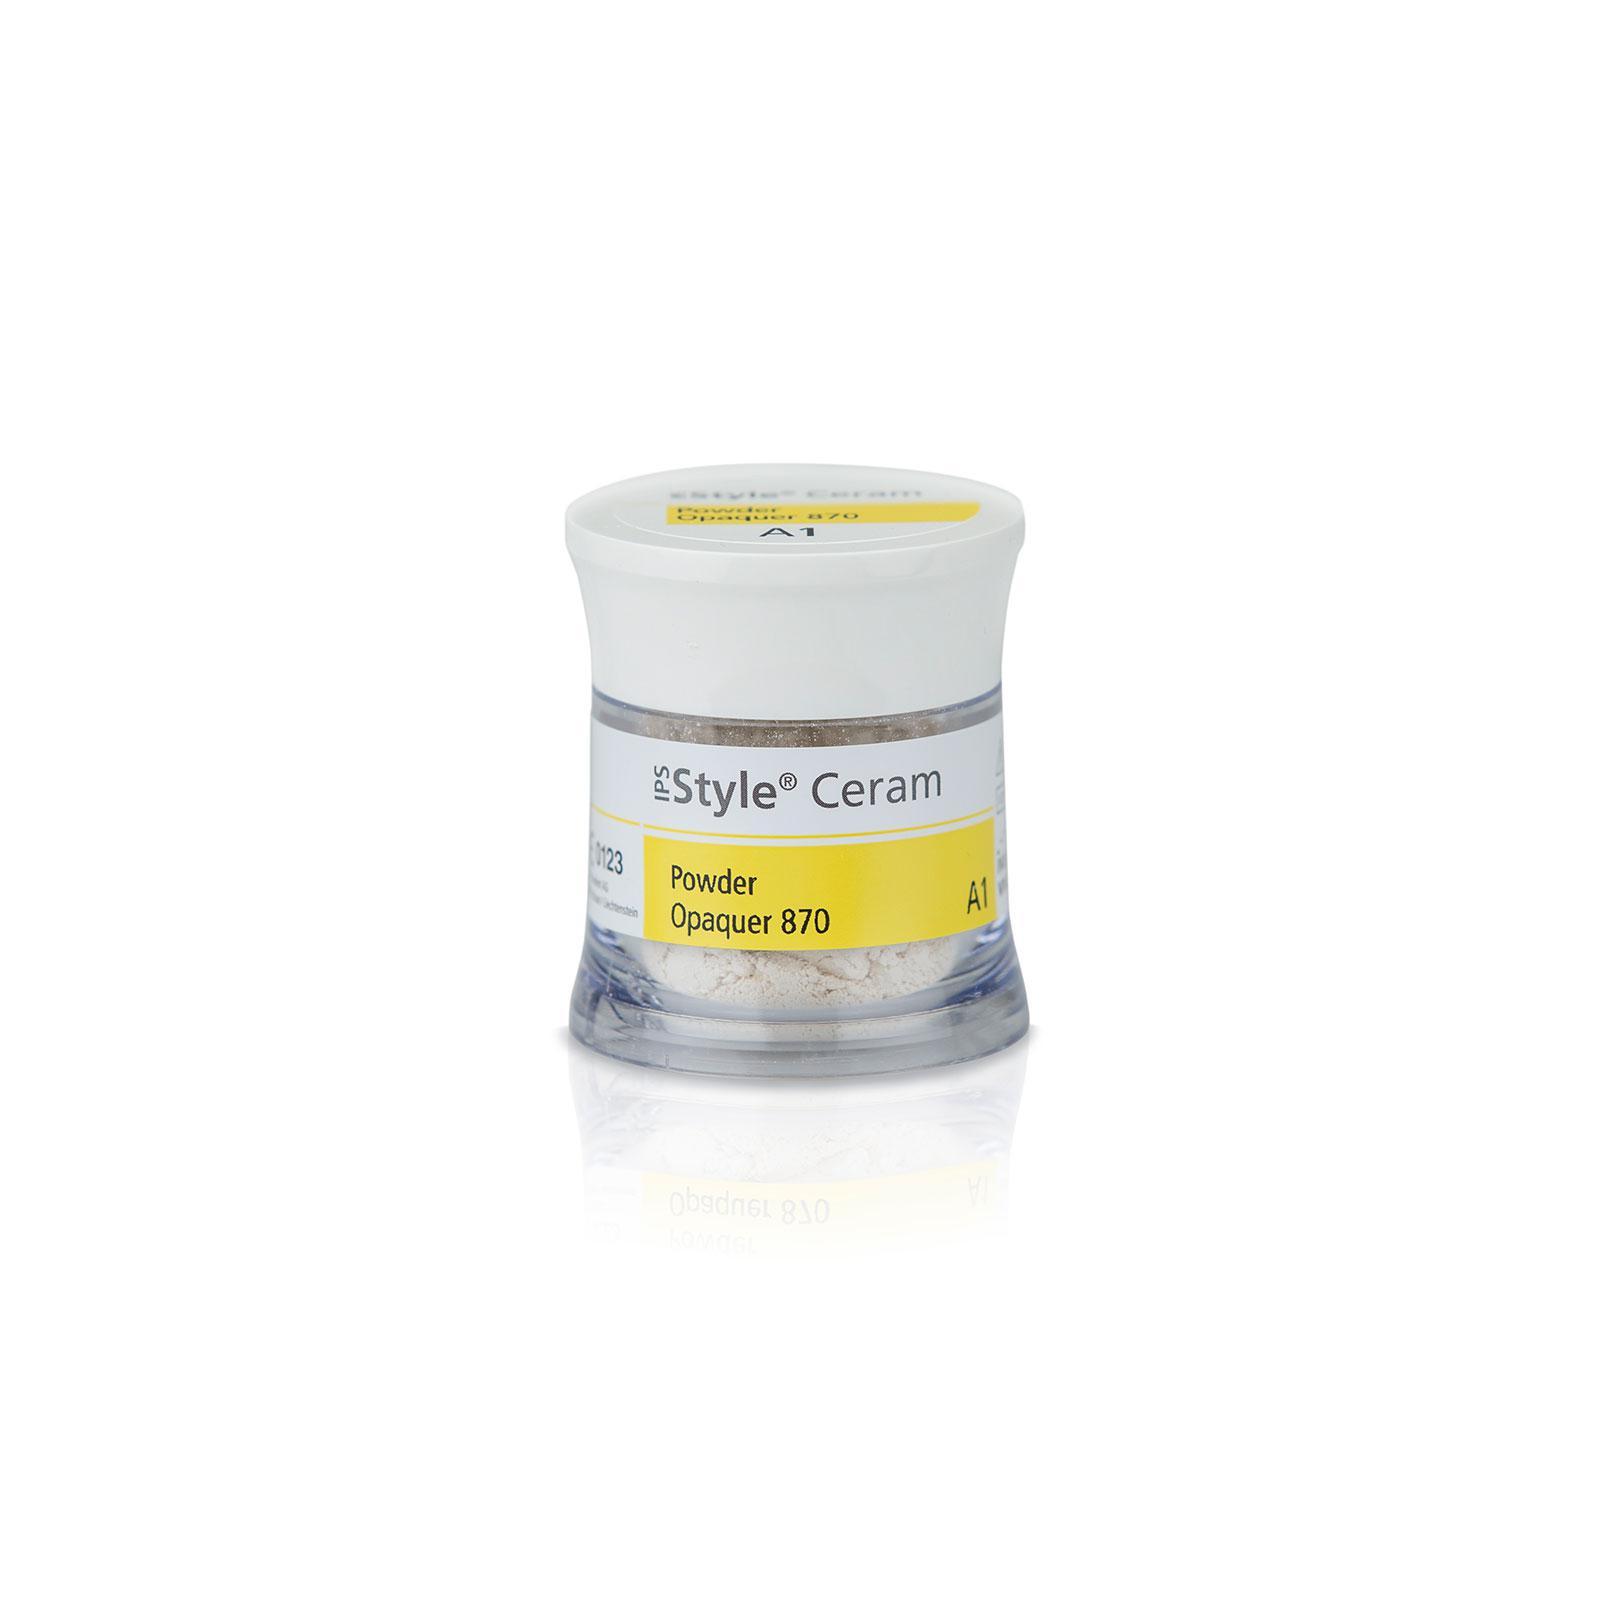 IPS Style Ceram Pow Opaquer 870 18g B2